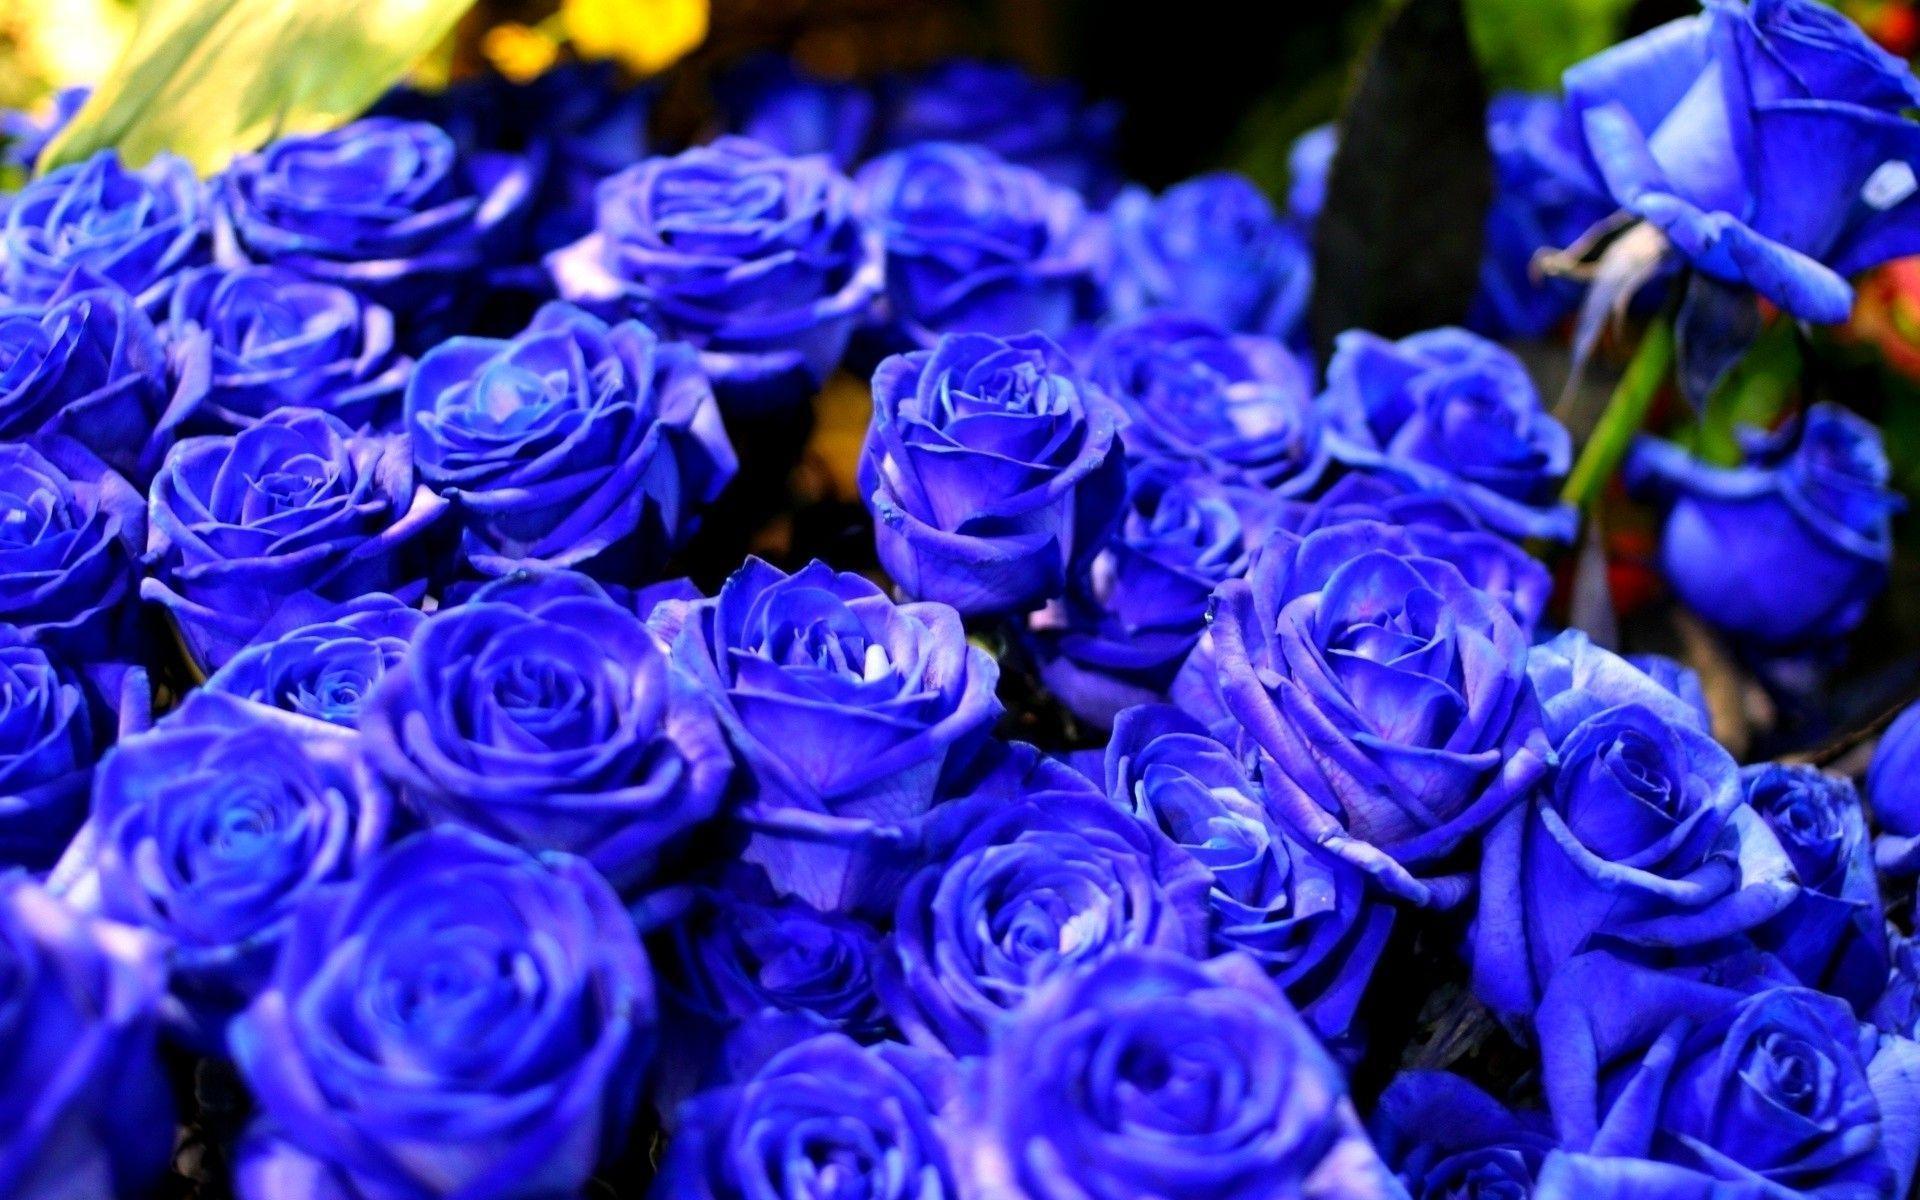 Blue Rose Backgrounds   Wallpaper Cave